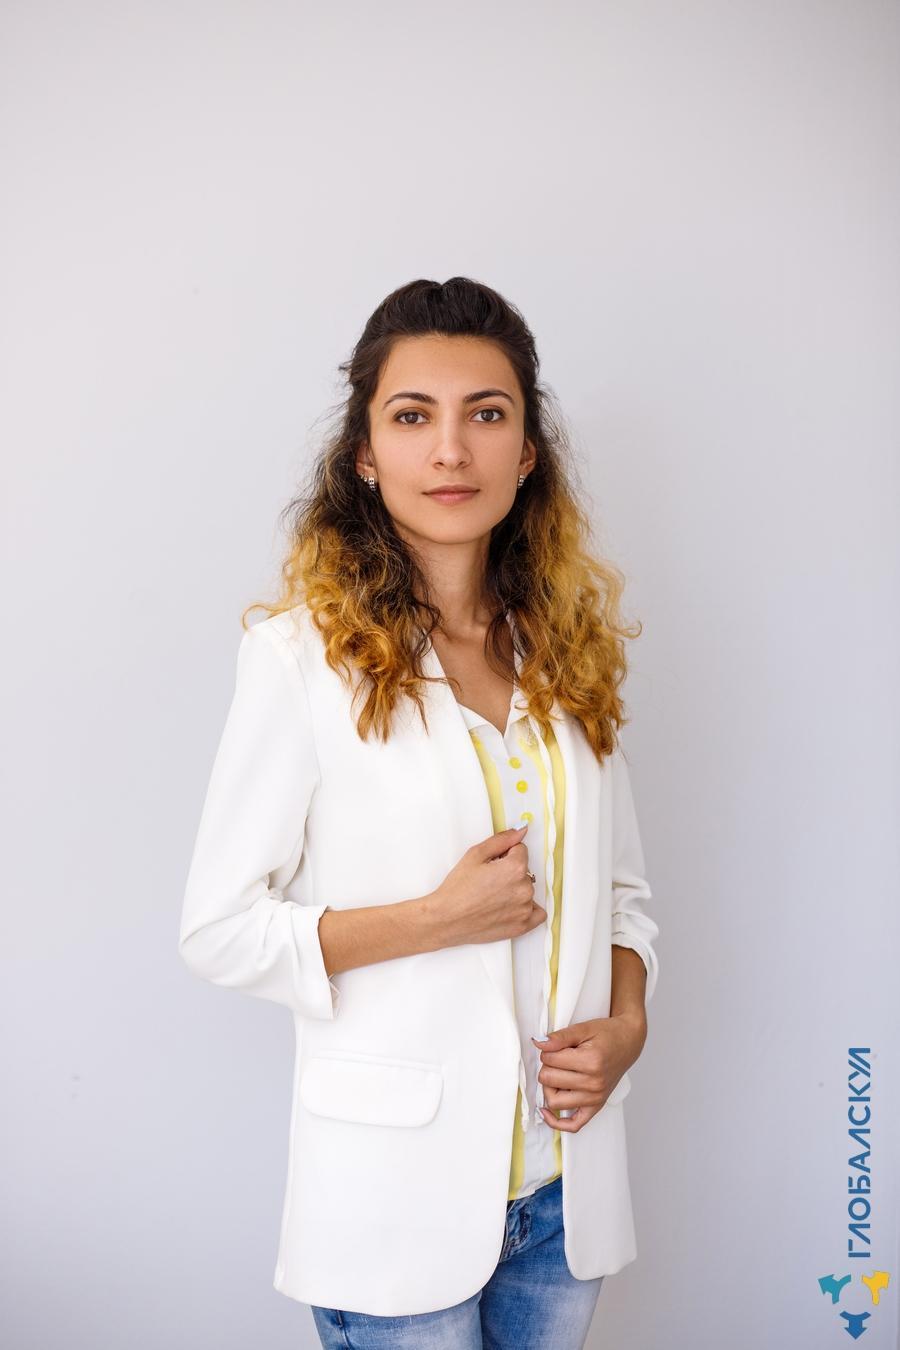 Григорян Анна